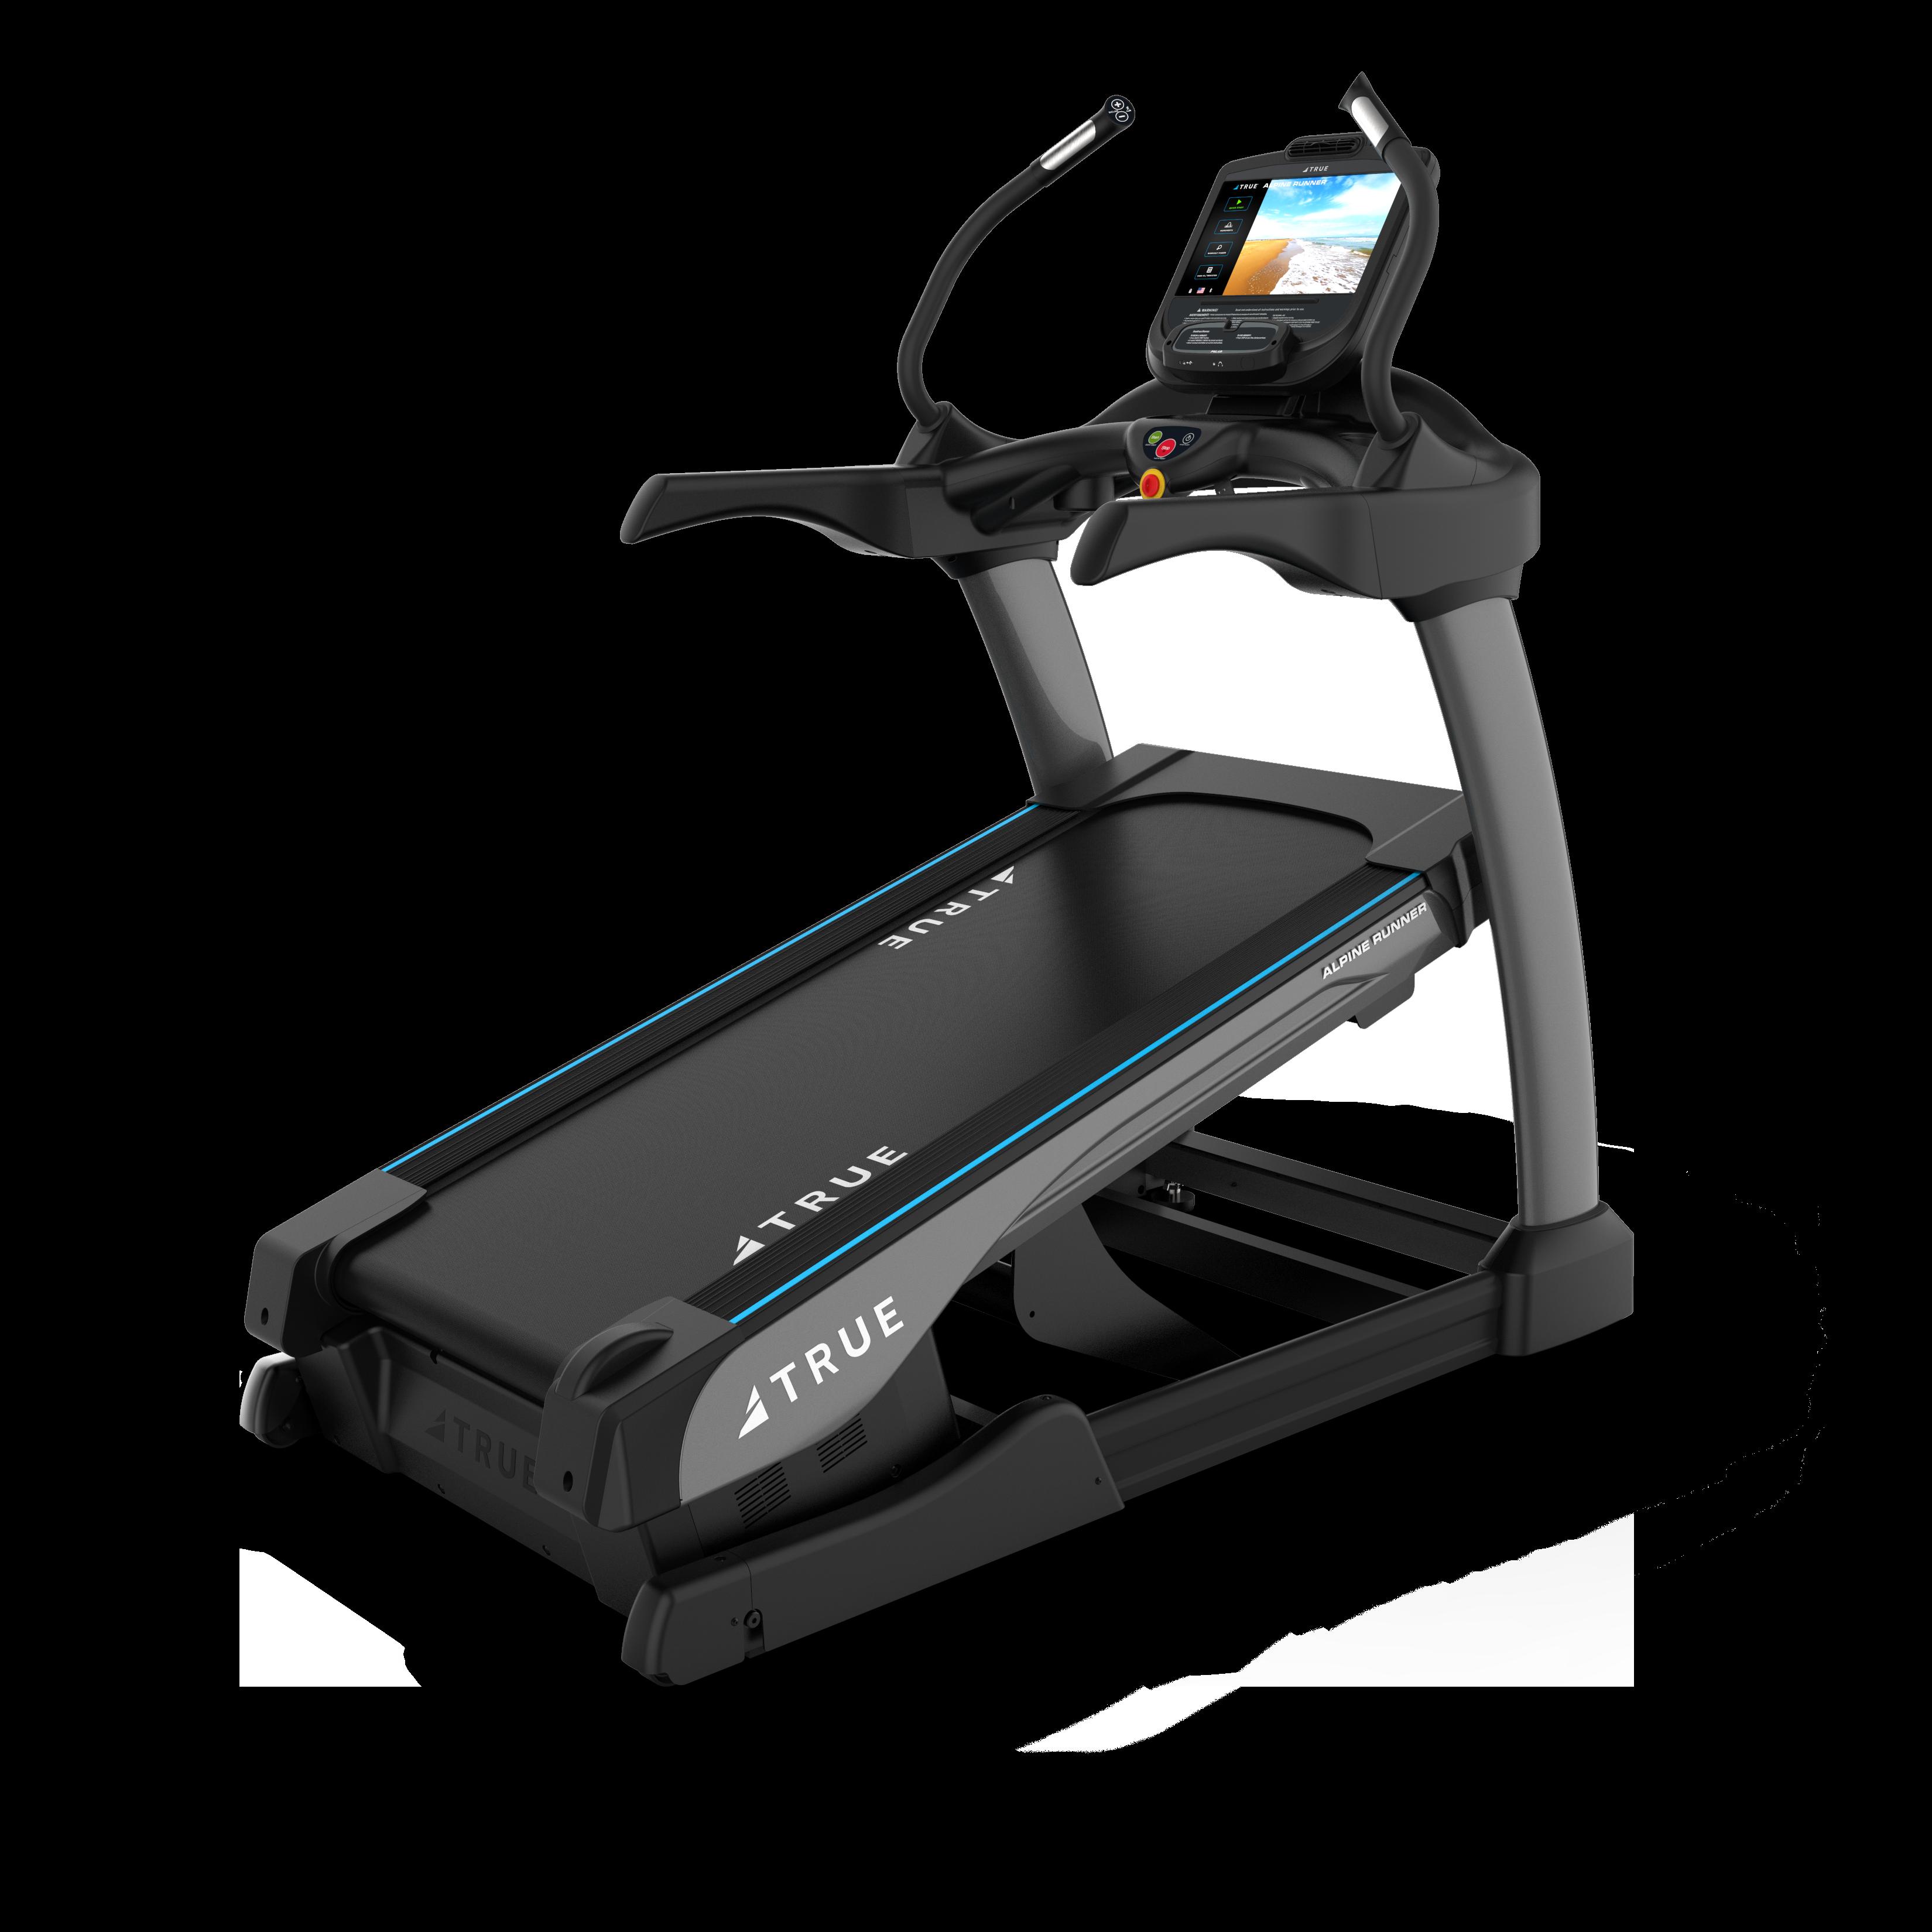 TRUE TI1000 Alpine Runner Incline Trainer